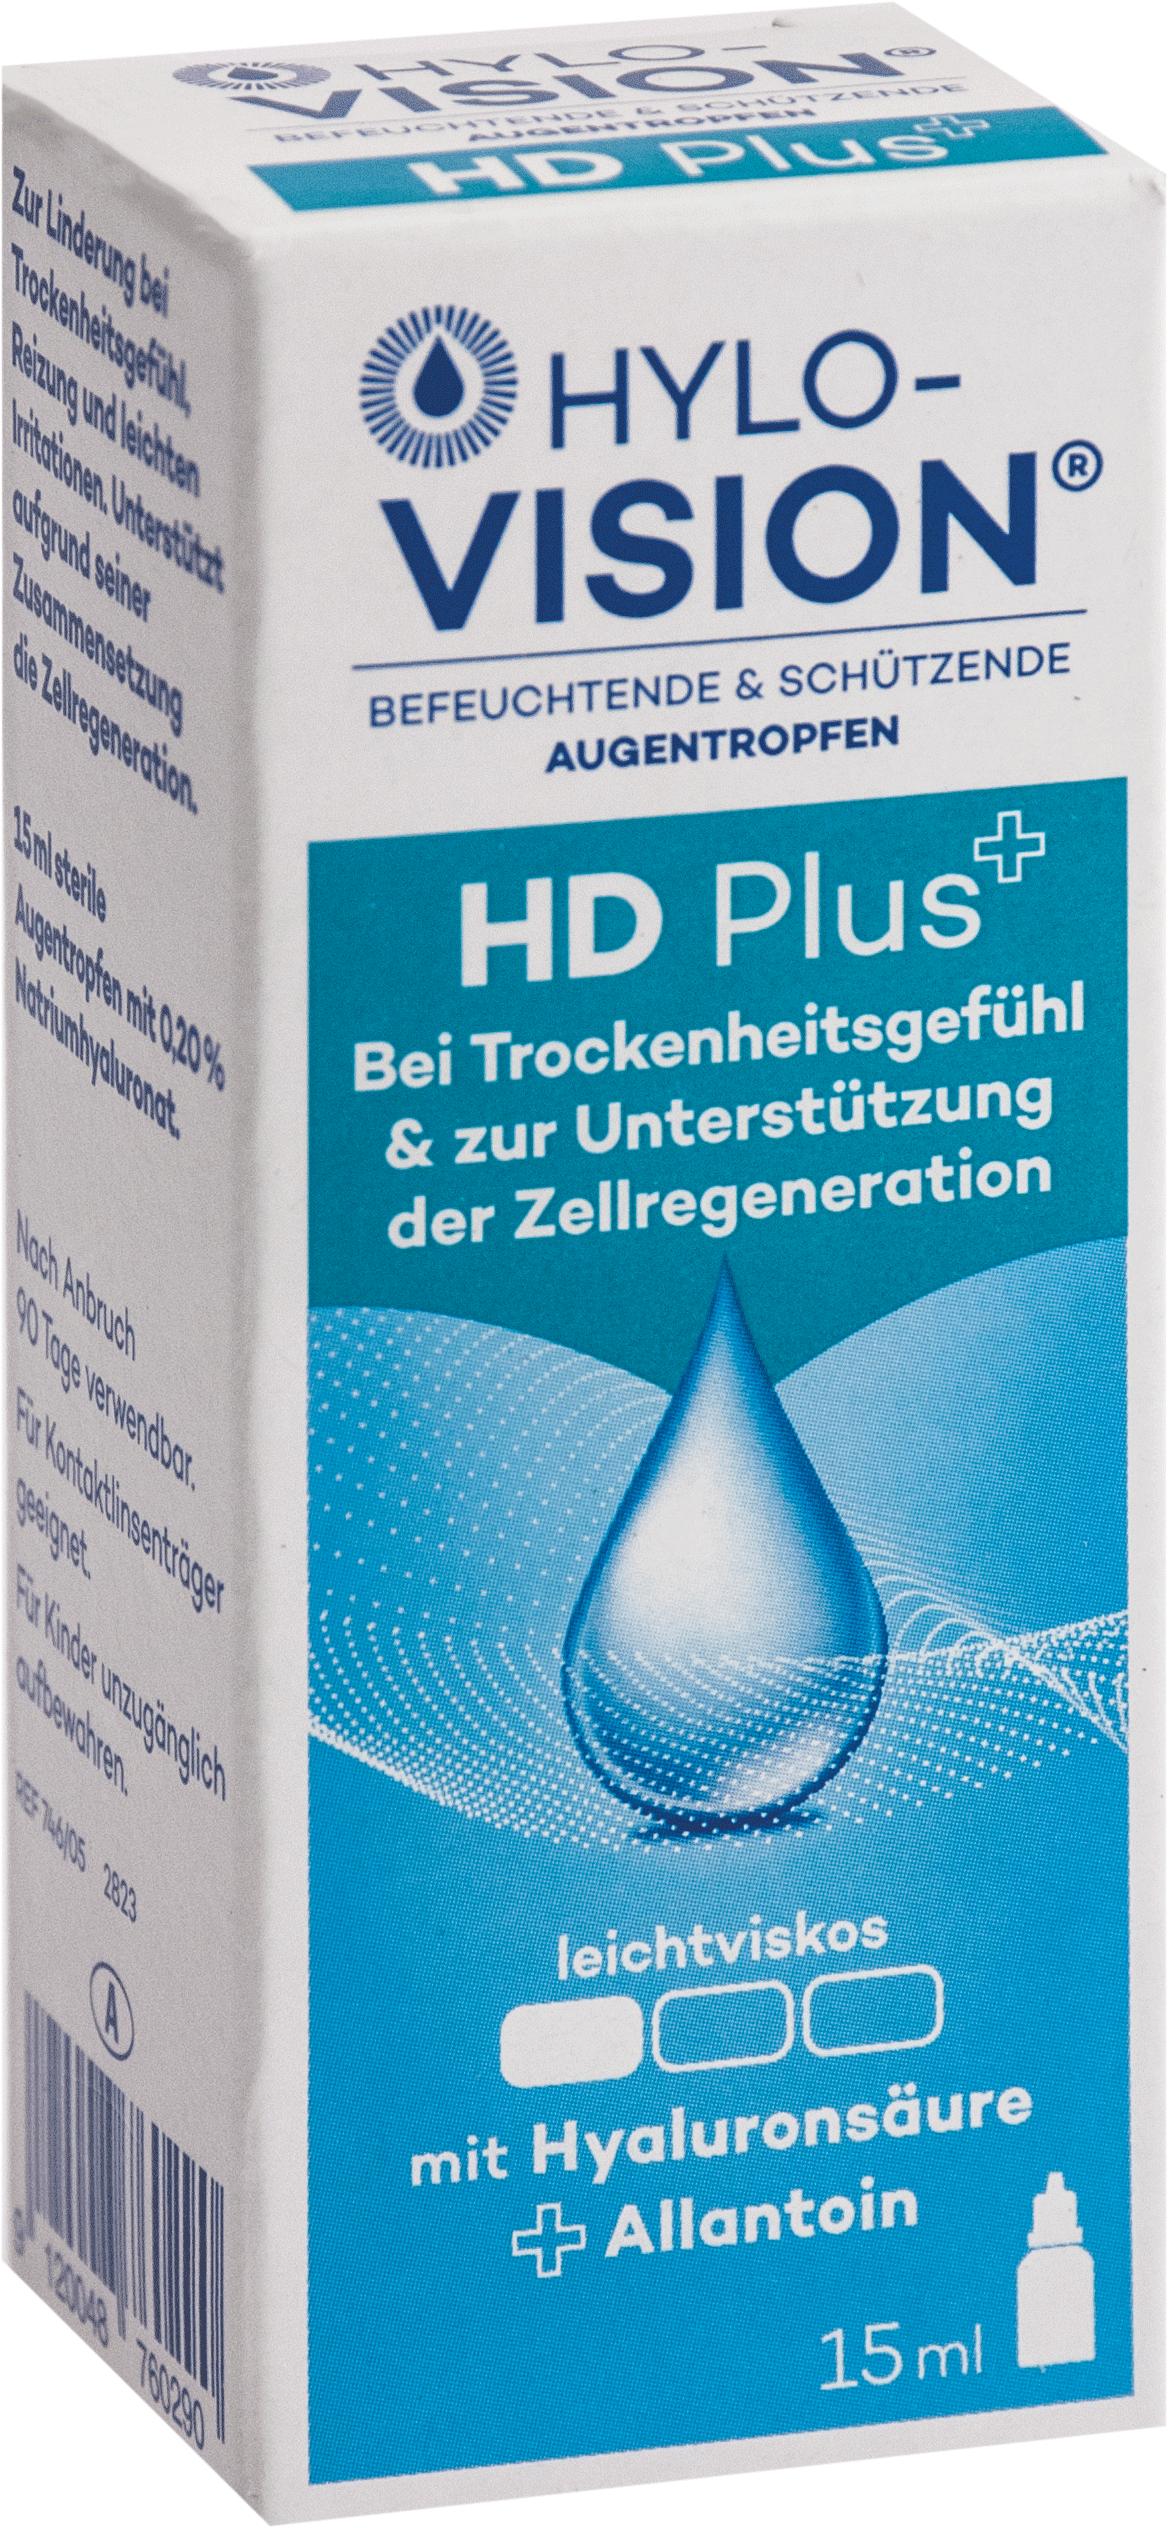 HYLO-VISION HD plus